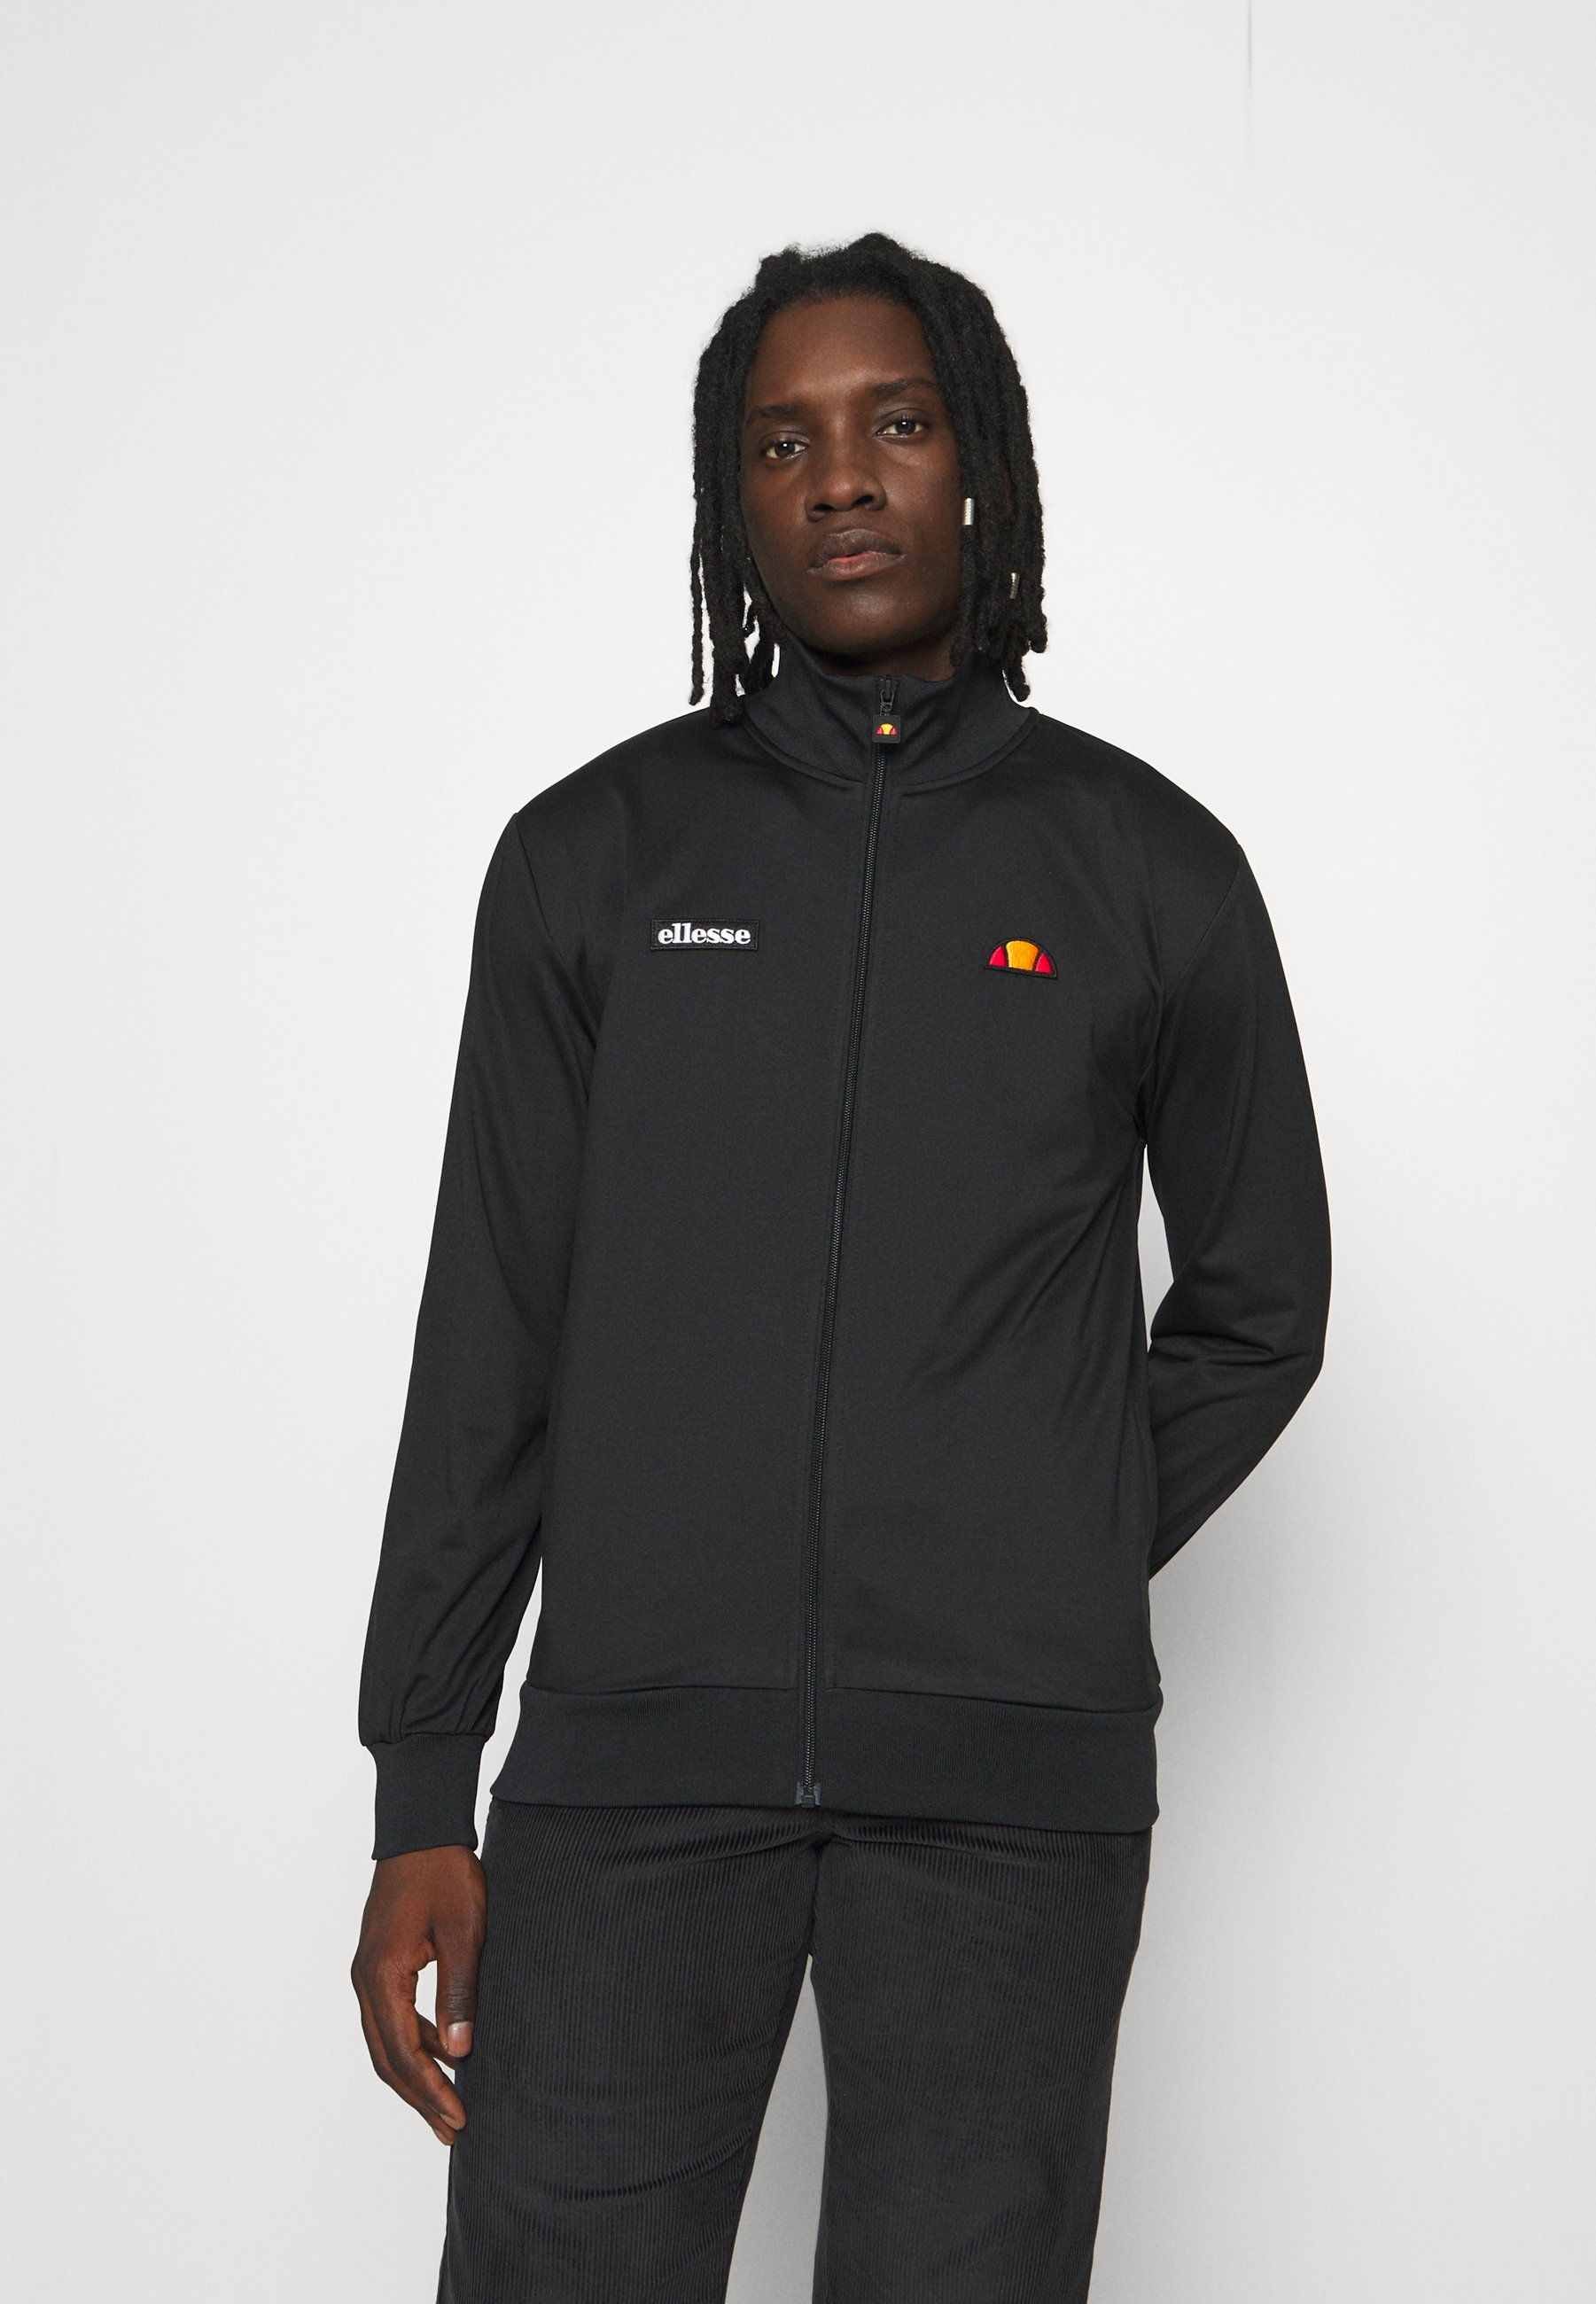 Men TORELO ZIP JACKET - Training jacket